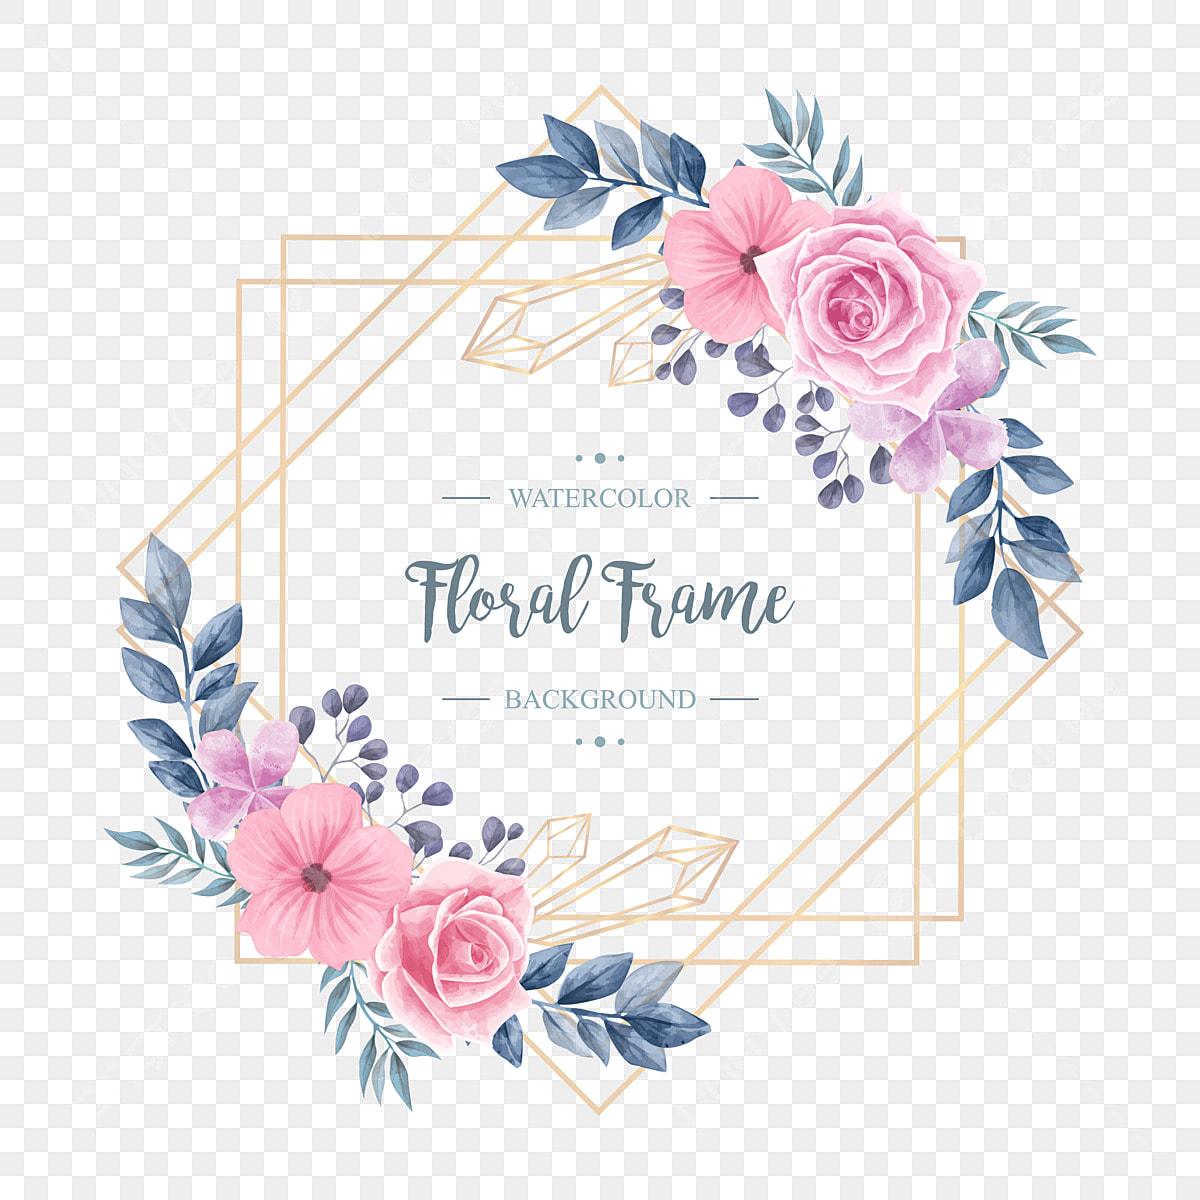 flower circle png images vector and psd files free download on pngtree https pngtree com freepng elegant wedding vintage watercolor floral flower frame 4844487 html